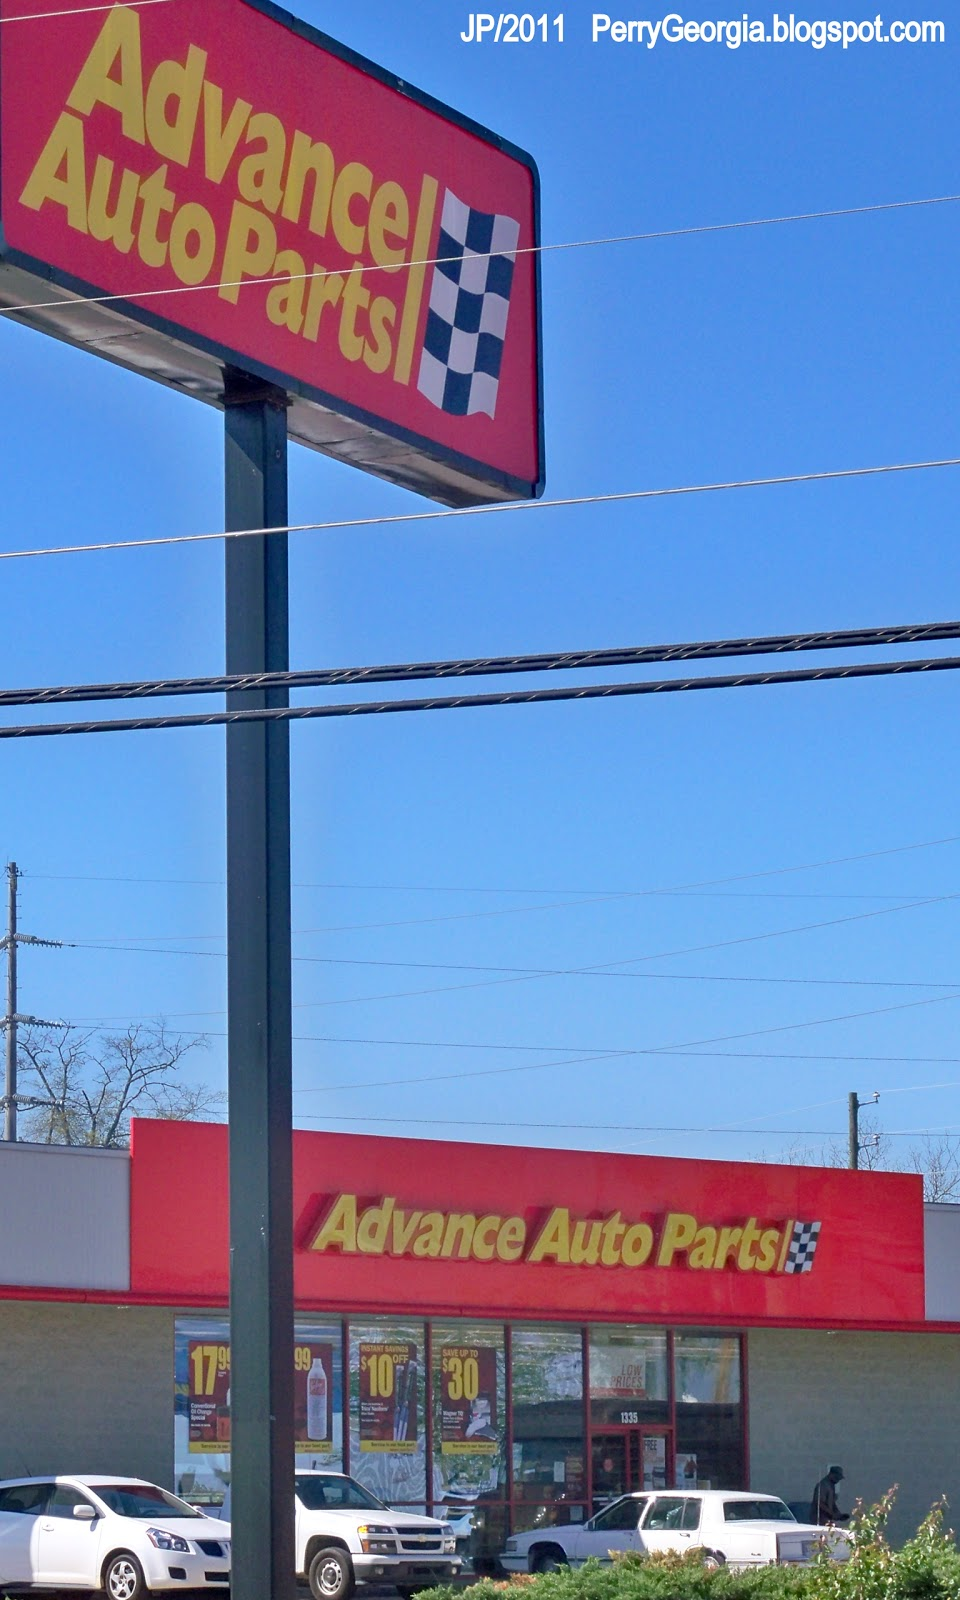 Perry Georgia Car Dealerships